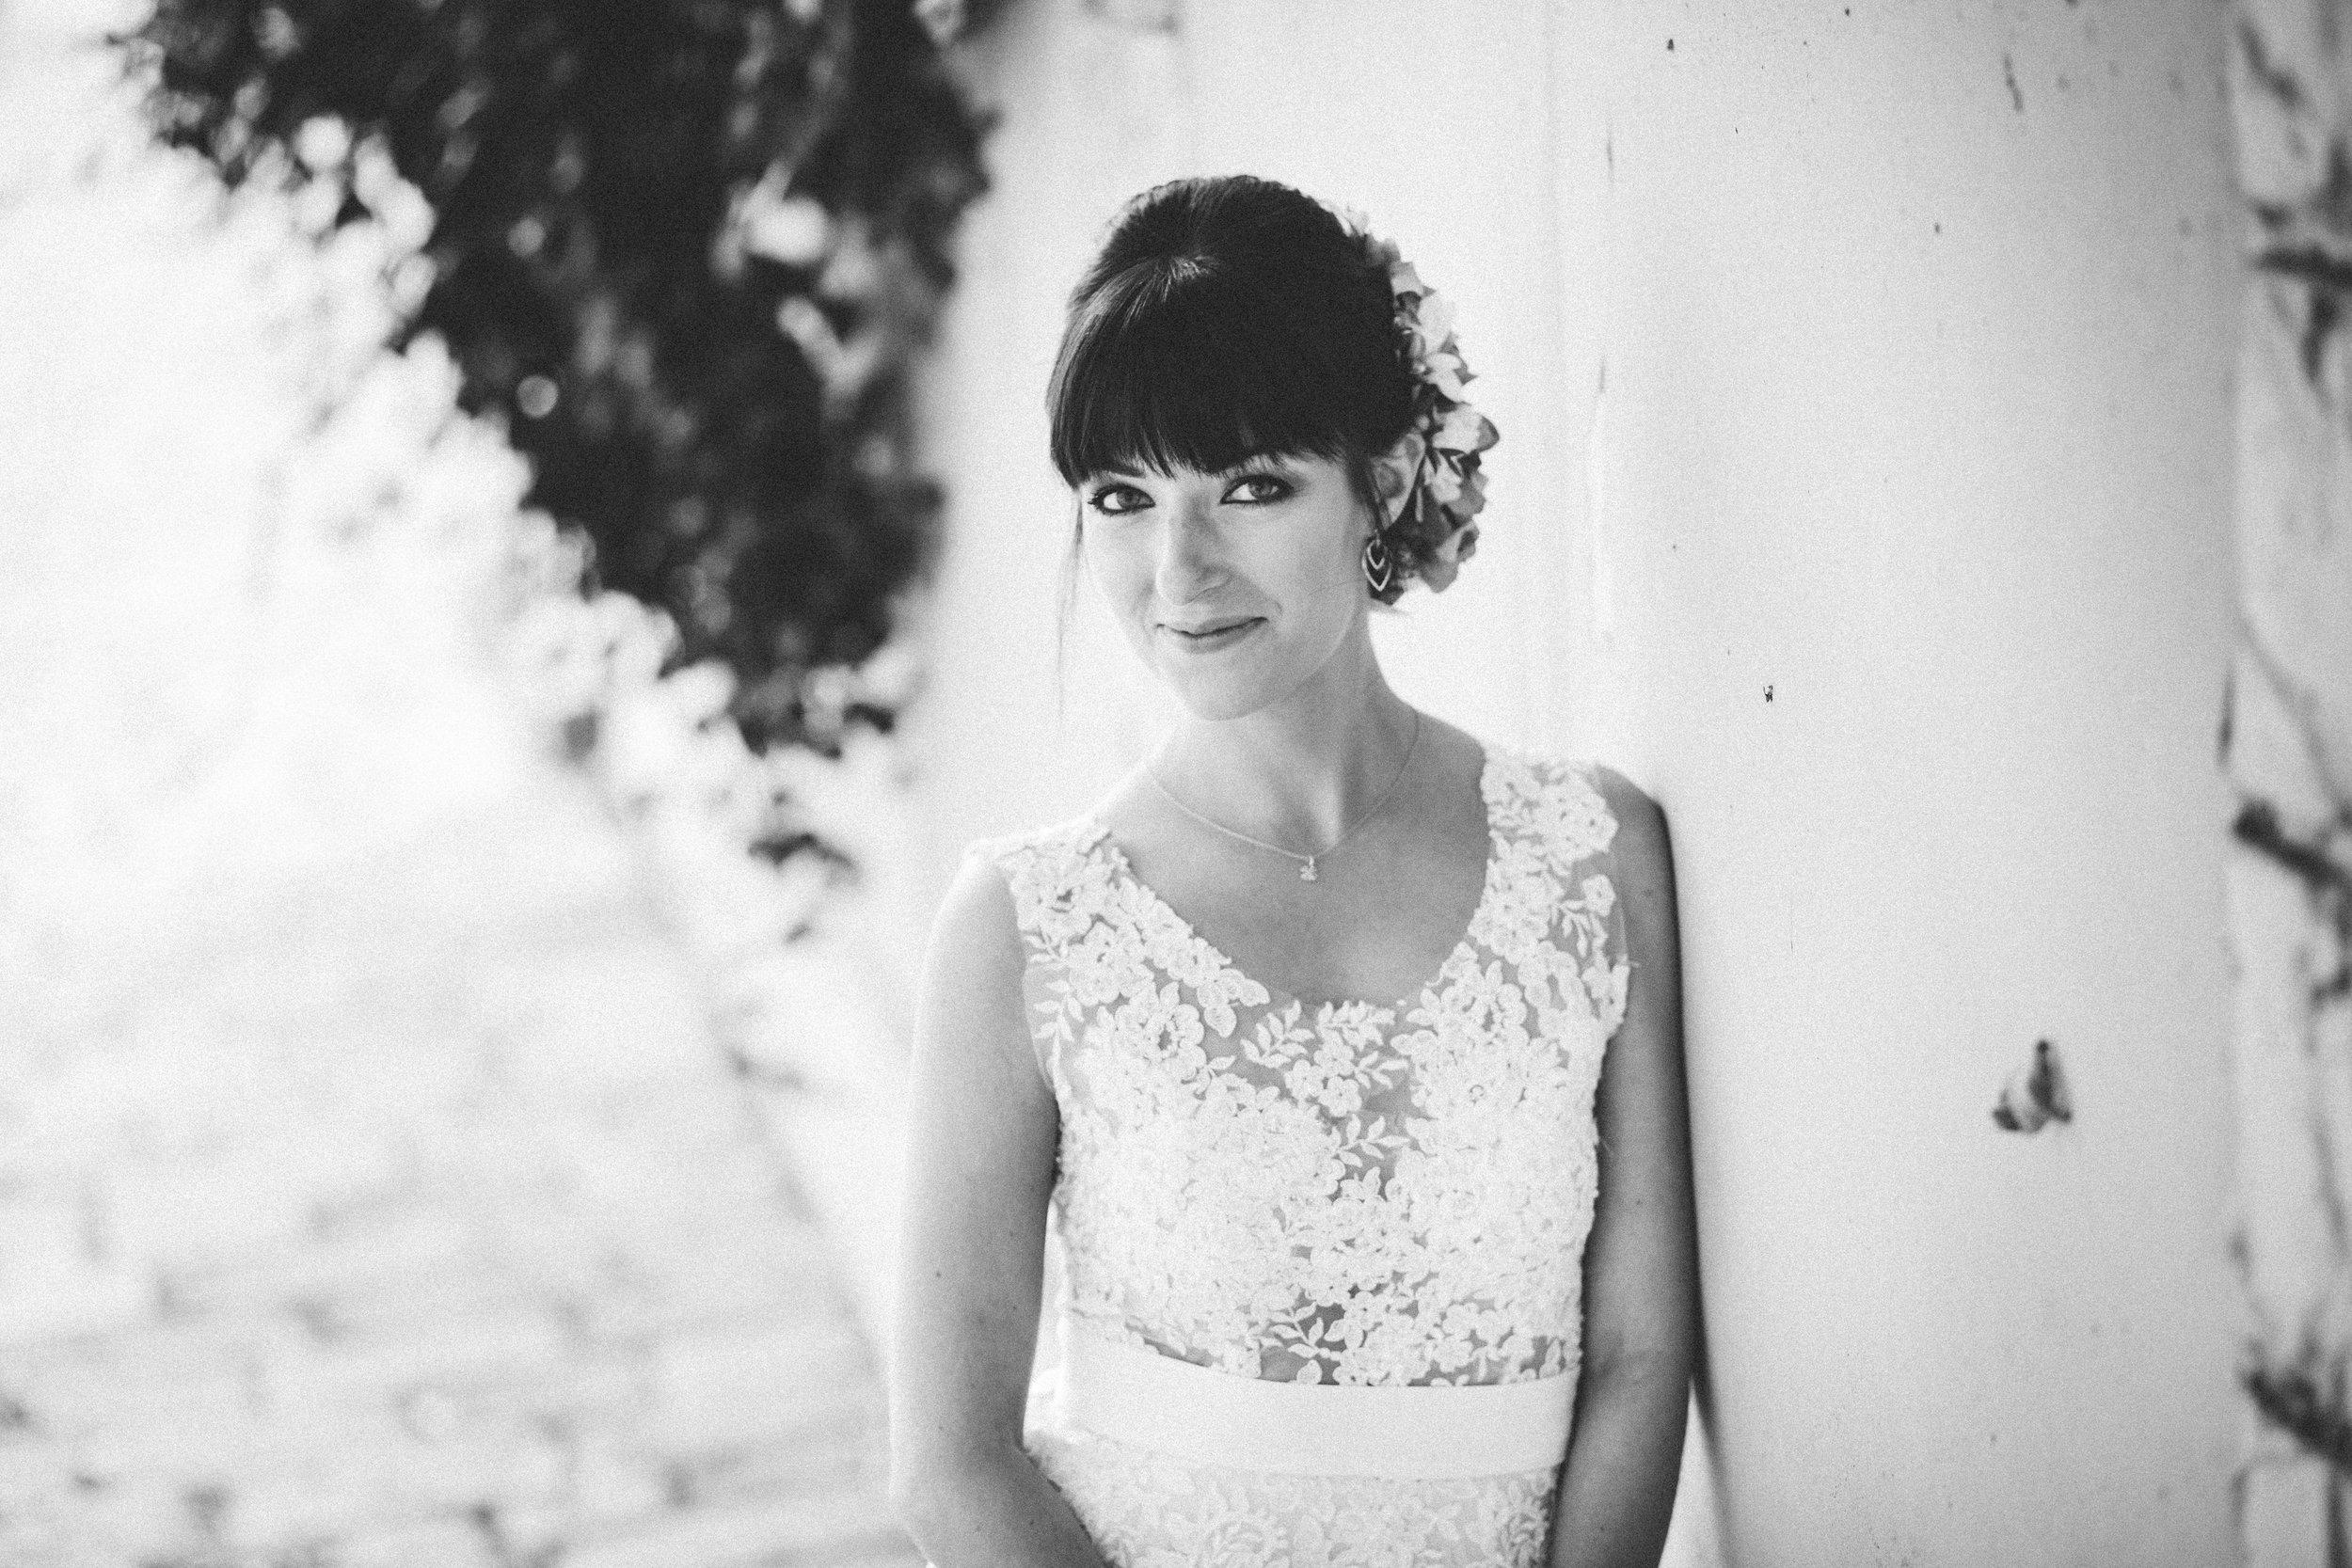 destination-wedding-photographer-bratislava-slovakia-europe-portrait-session-bride-bw.jpg